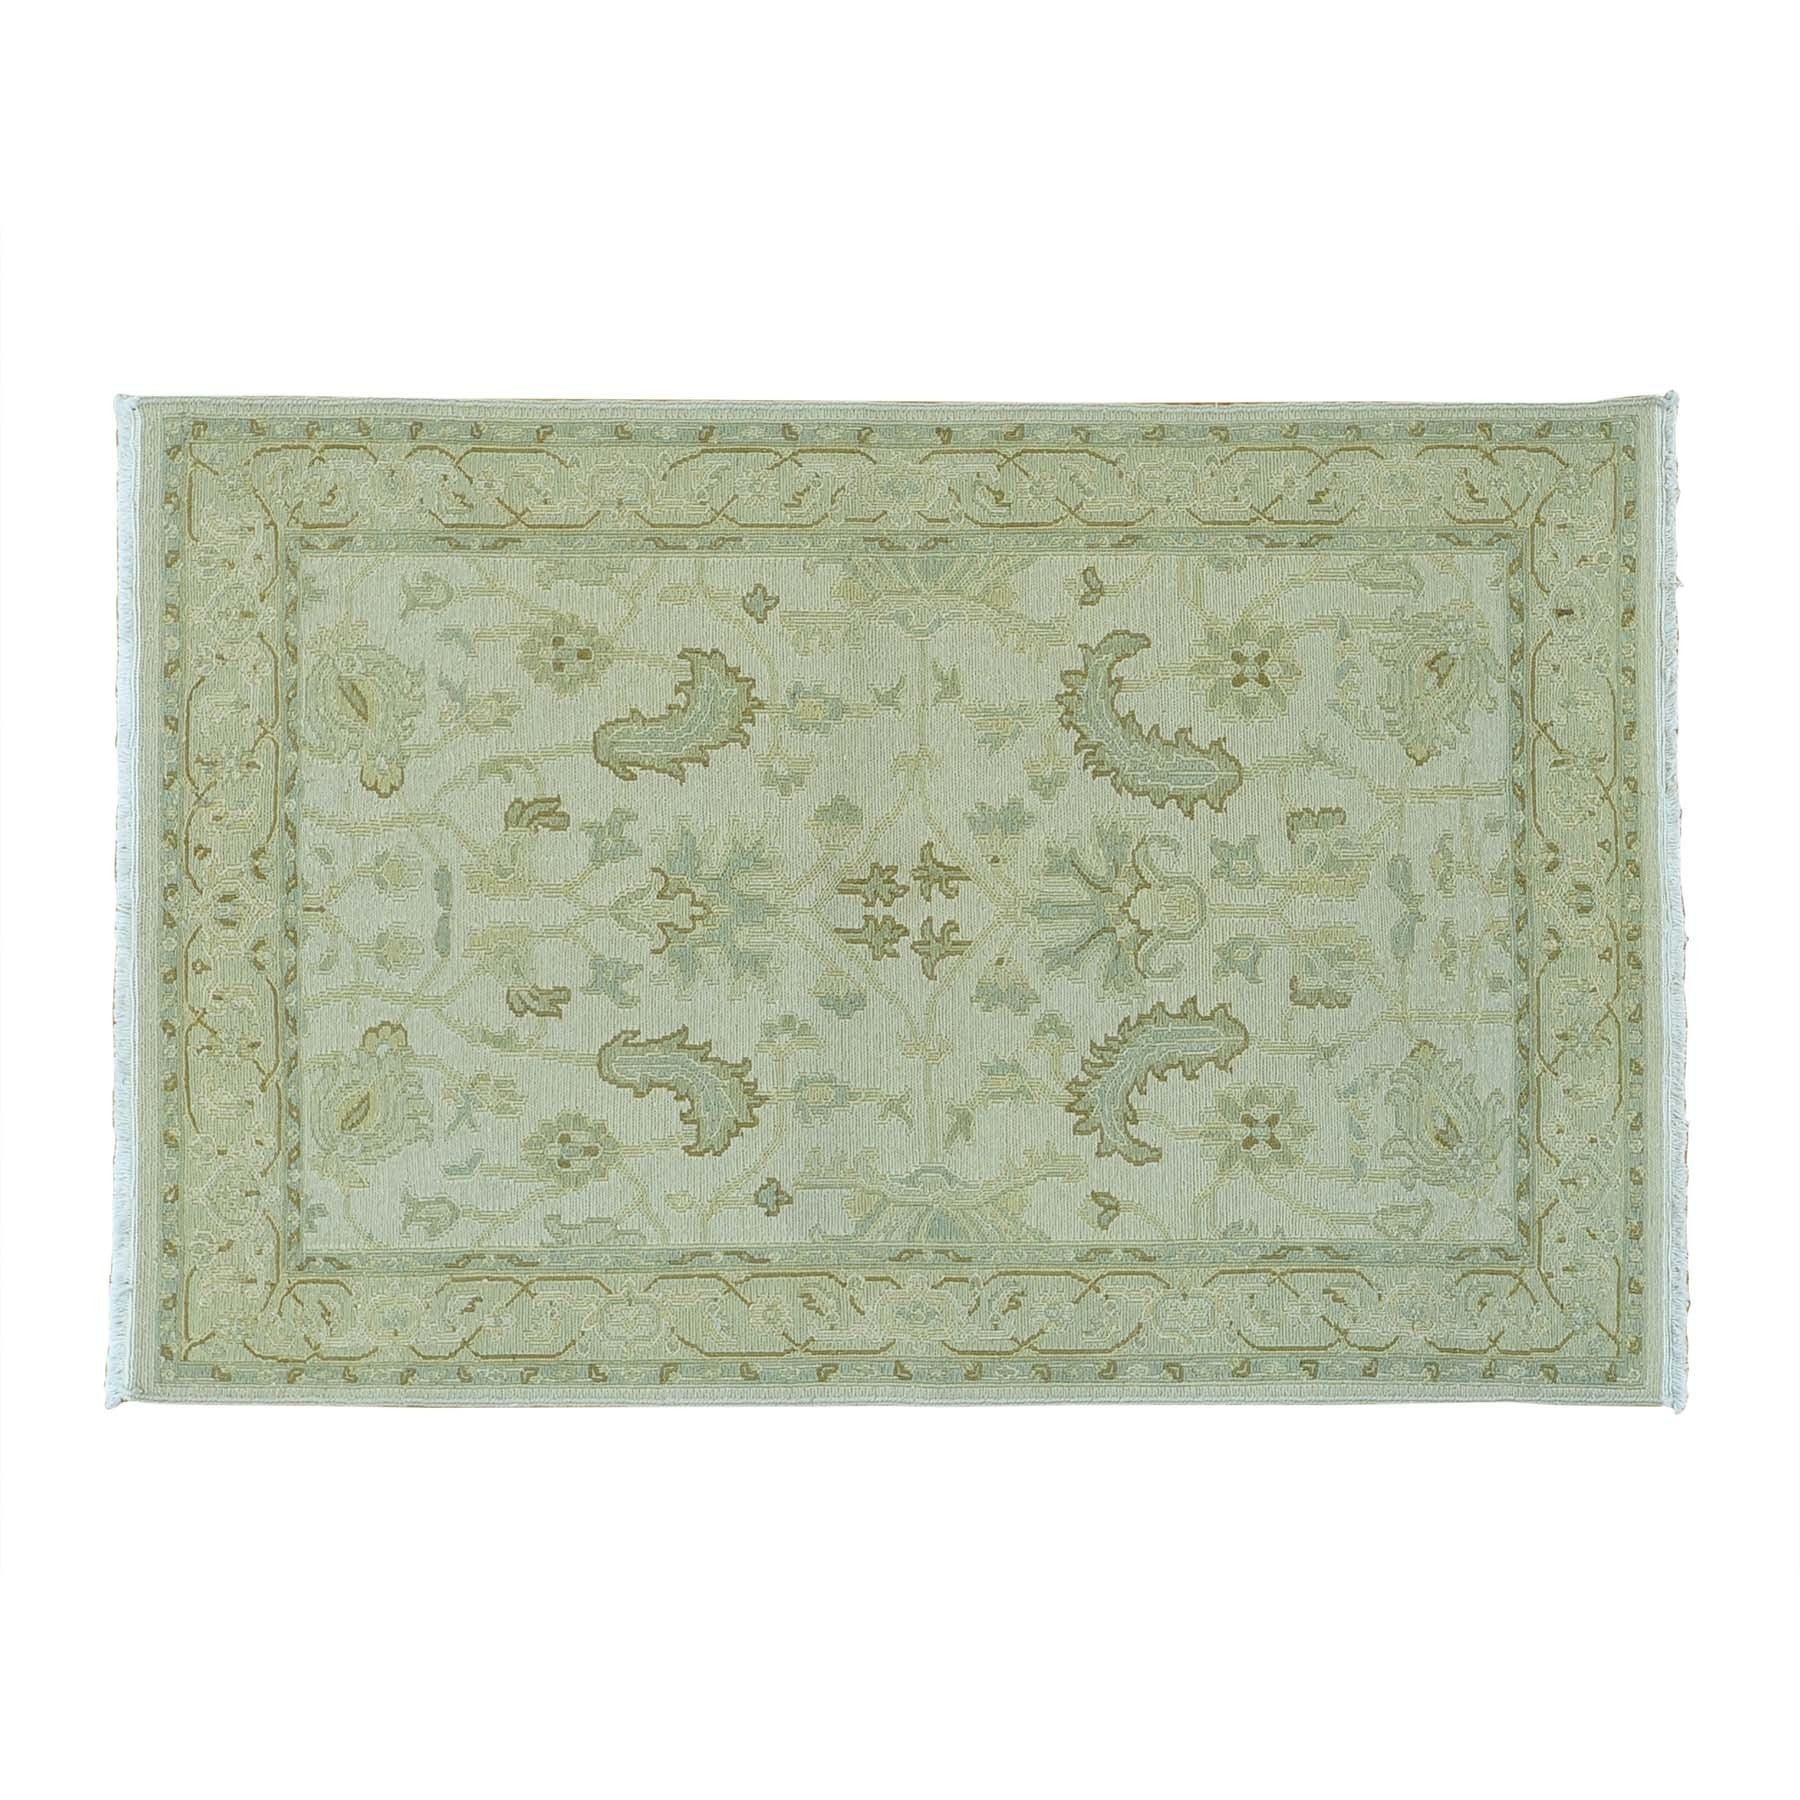 1800getarug Soft Colors Wool Flat Weave Soumak Hand-woven...